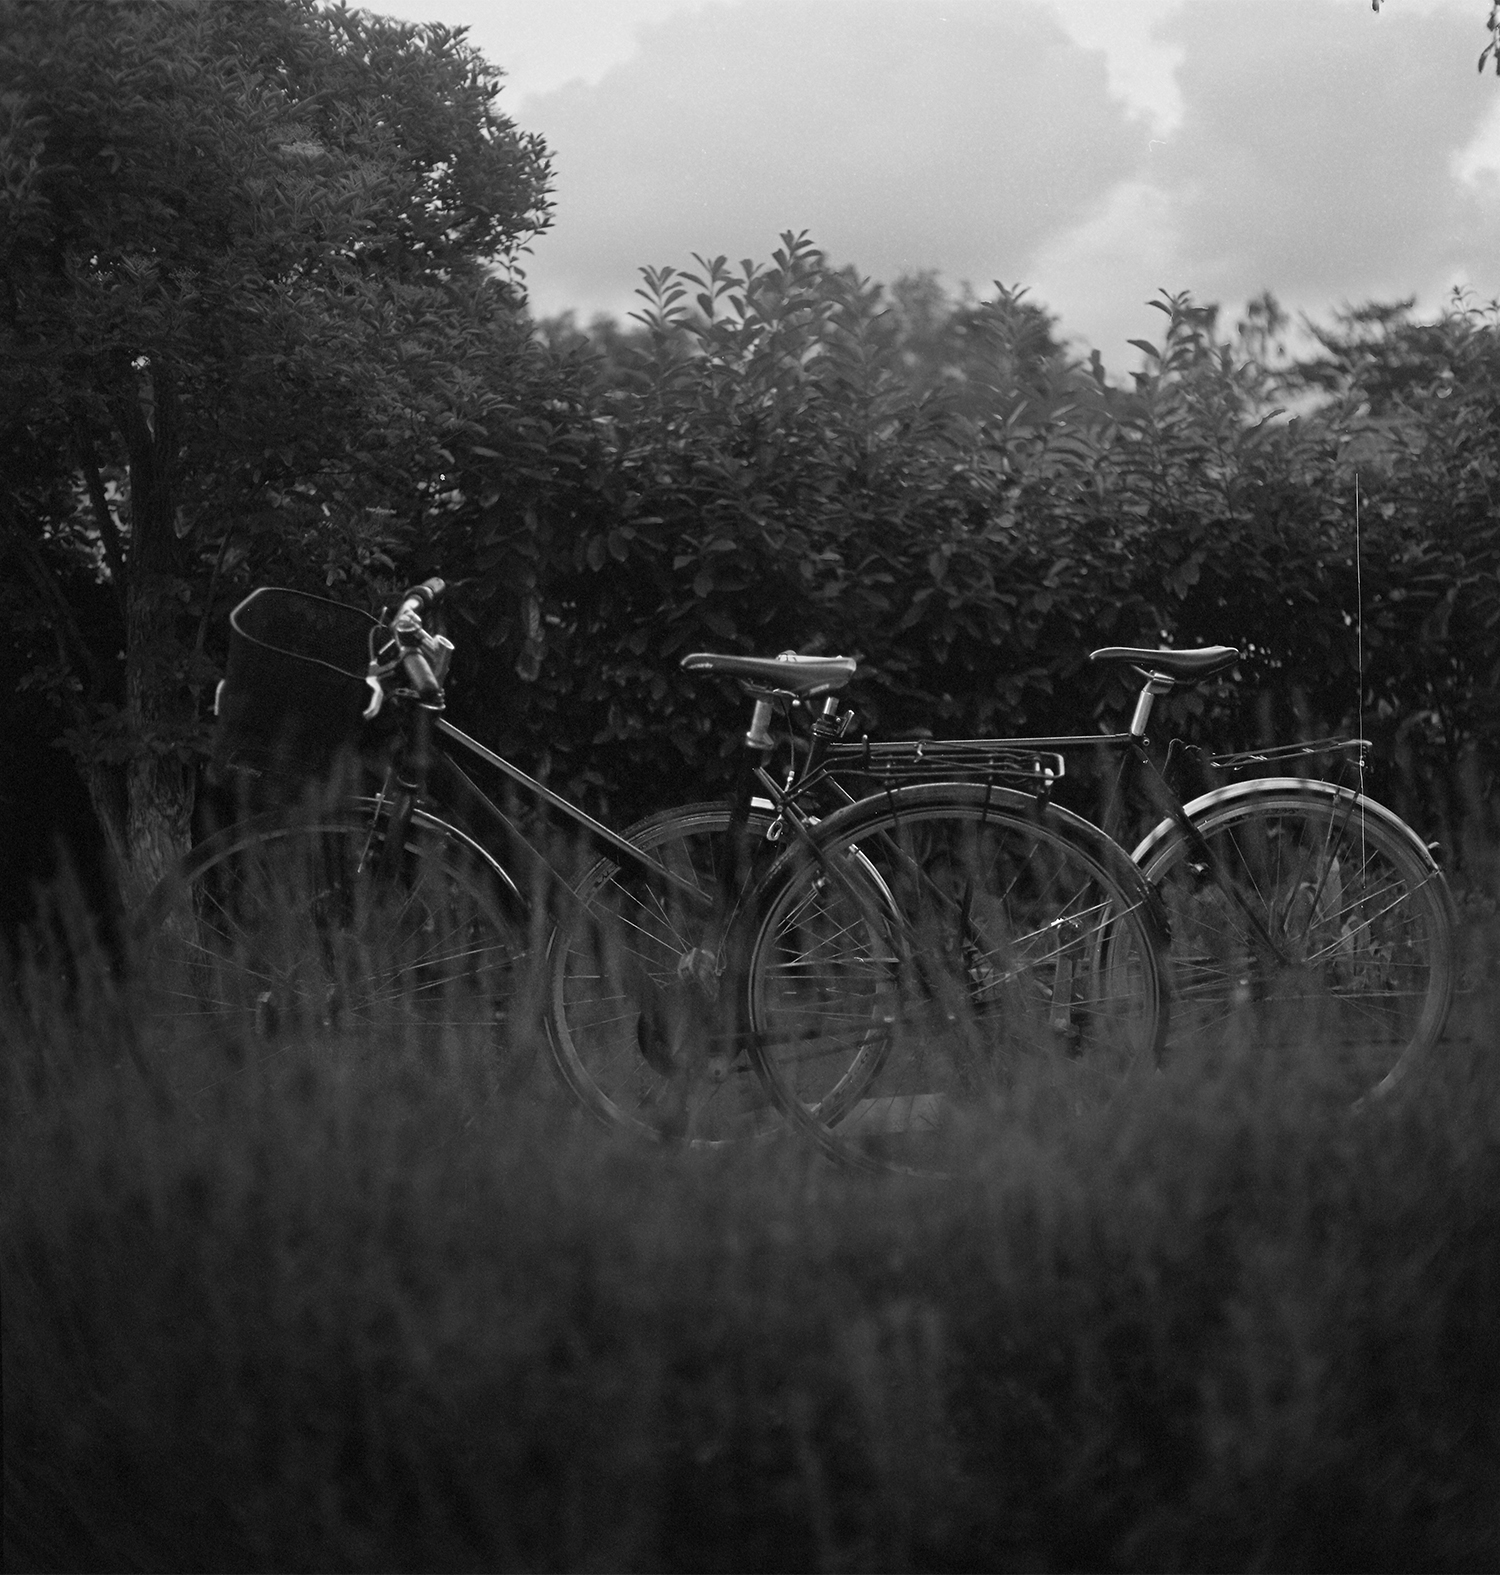 Bikes_Sm.jpg